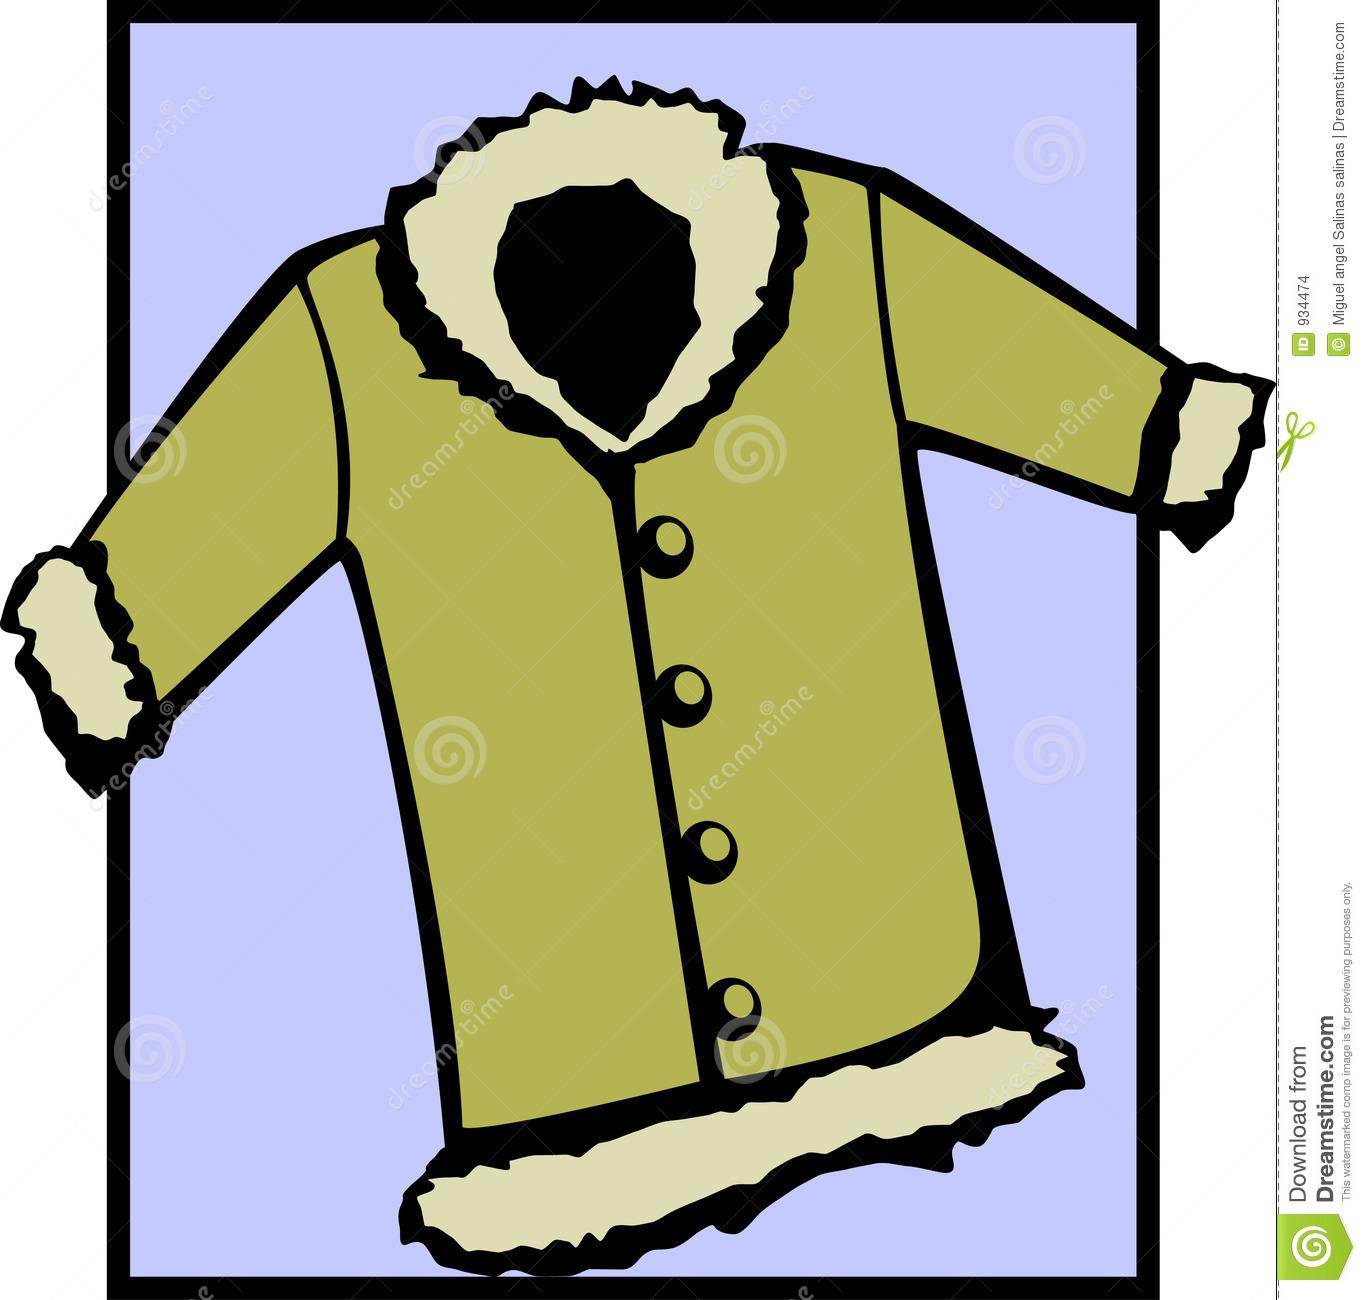 Hood clipart winter coat Collection  Clipart coats clipart